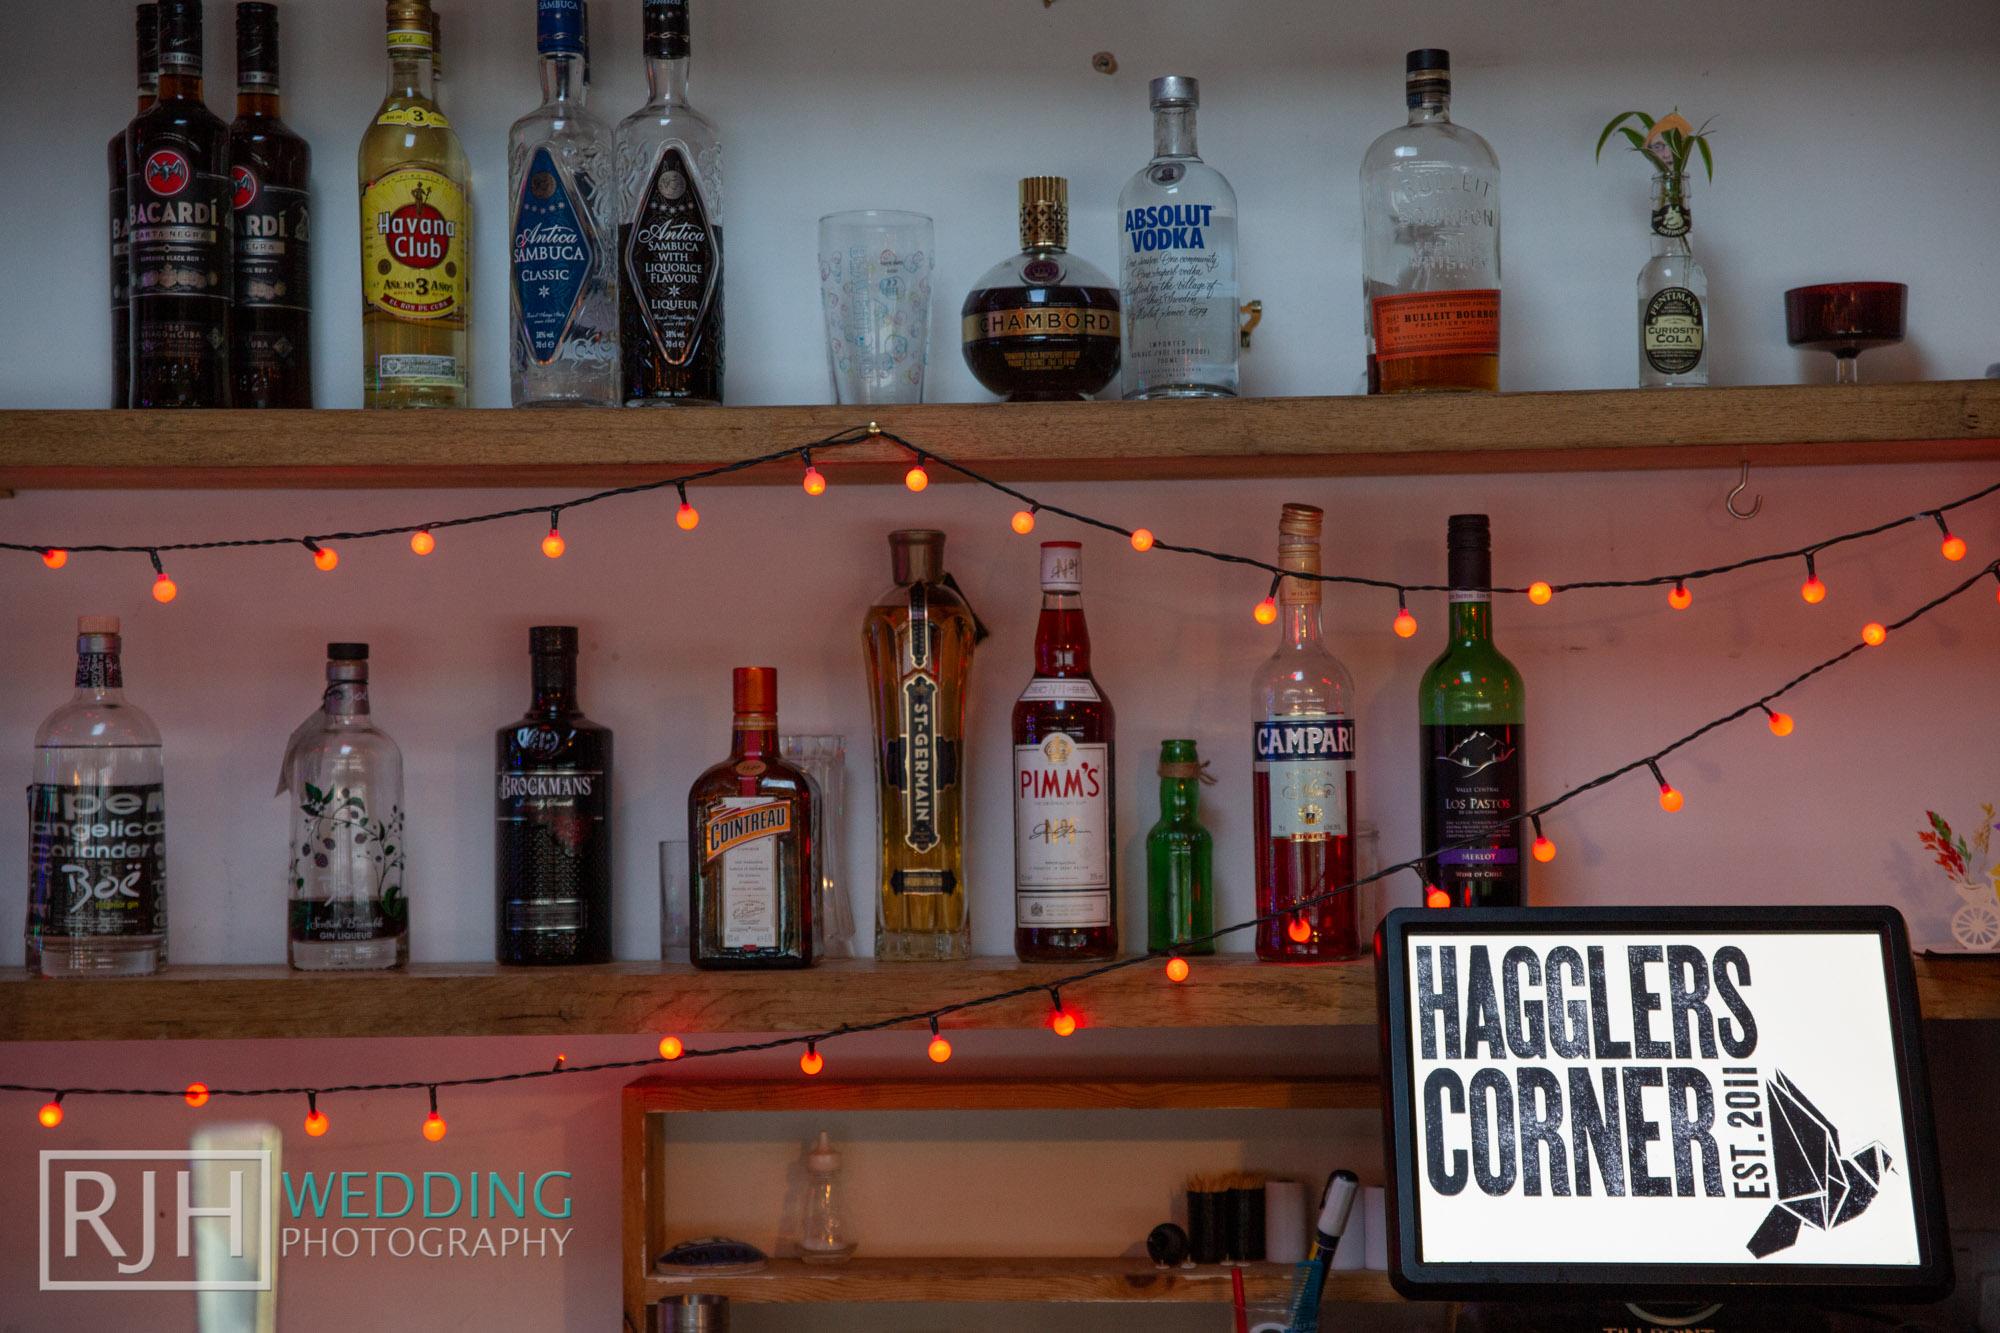 Hagglers Corner_Wilson Wedding_040_3C2A0300.jpg